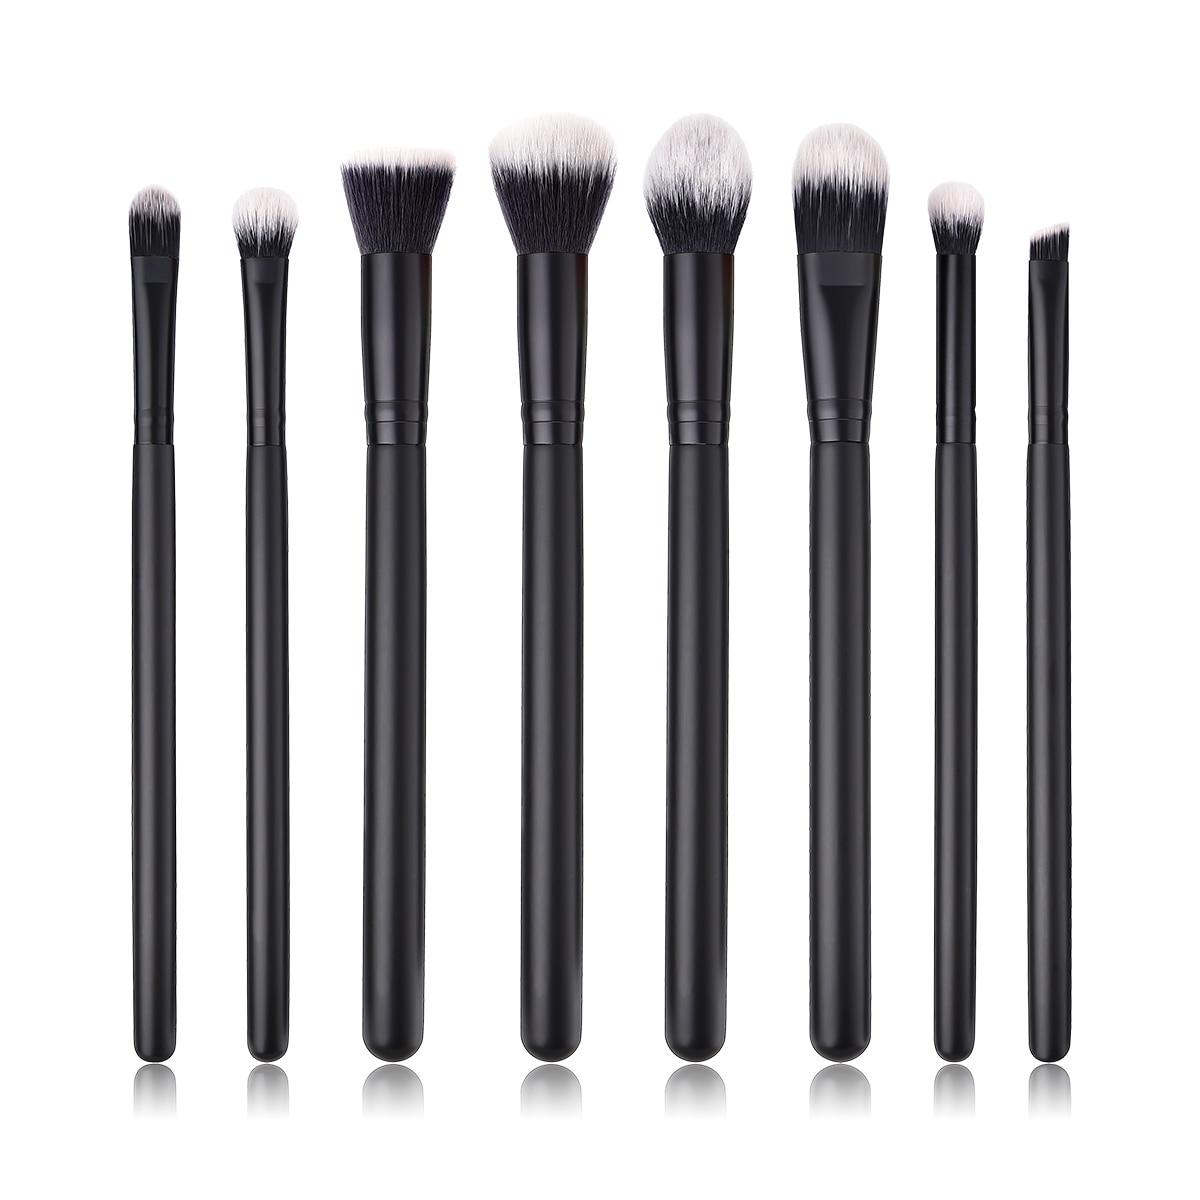 BBL 8pcs Makeup Brushes Eye Shadow / Powder / Blender / Concealer / Flat Foundation / Blush / Kabuki Brush Reals Professional mymei new professional flat contour blusher kabuki blush brush makeup cosmetics tools